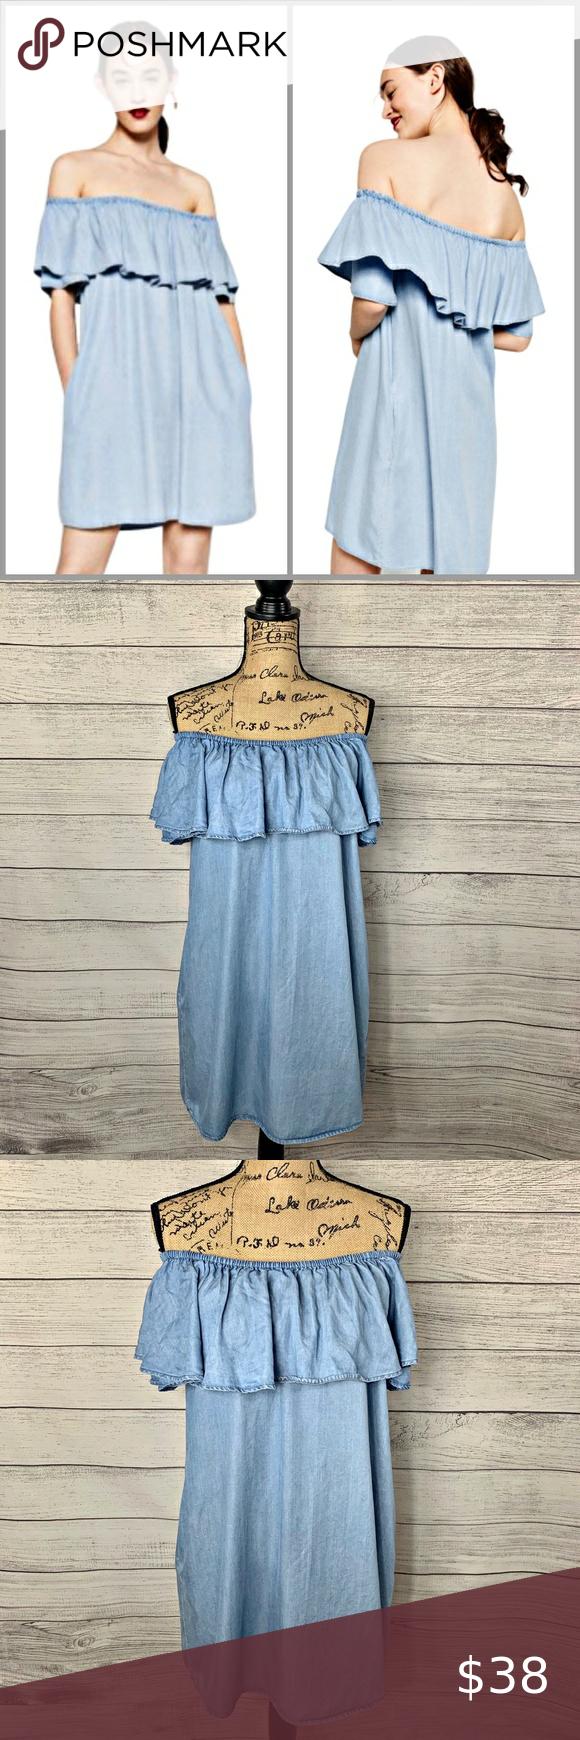 Zara Off The Shoulder Denim Ruffle Dress Sz S Denim Ruffle Dress Dresses Ruffle Dress [ 1740 x 580 Pixel ]